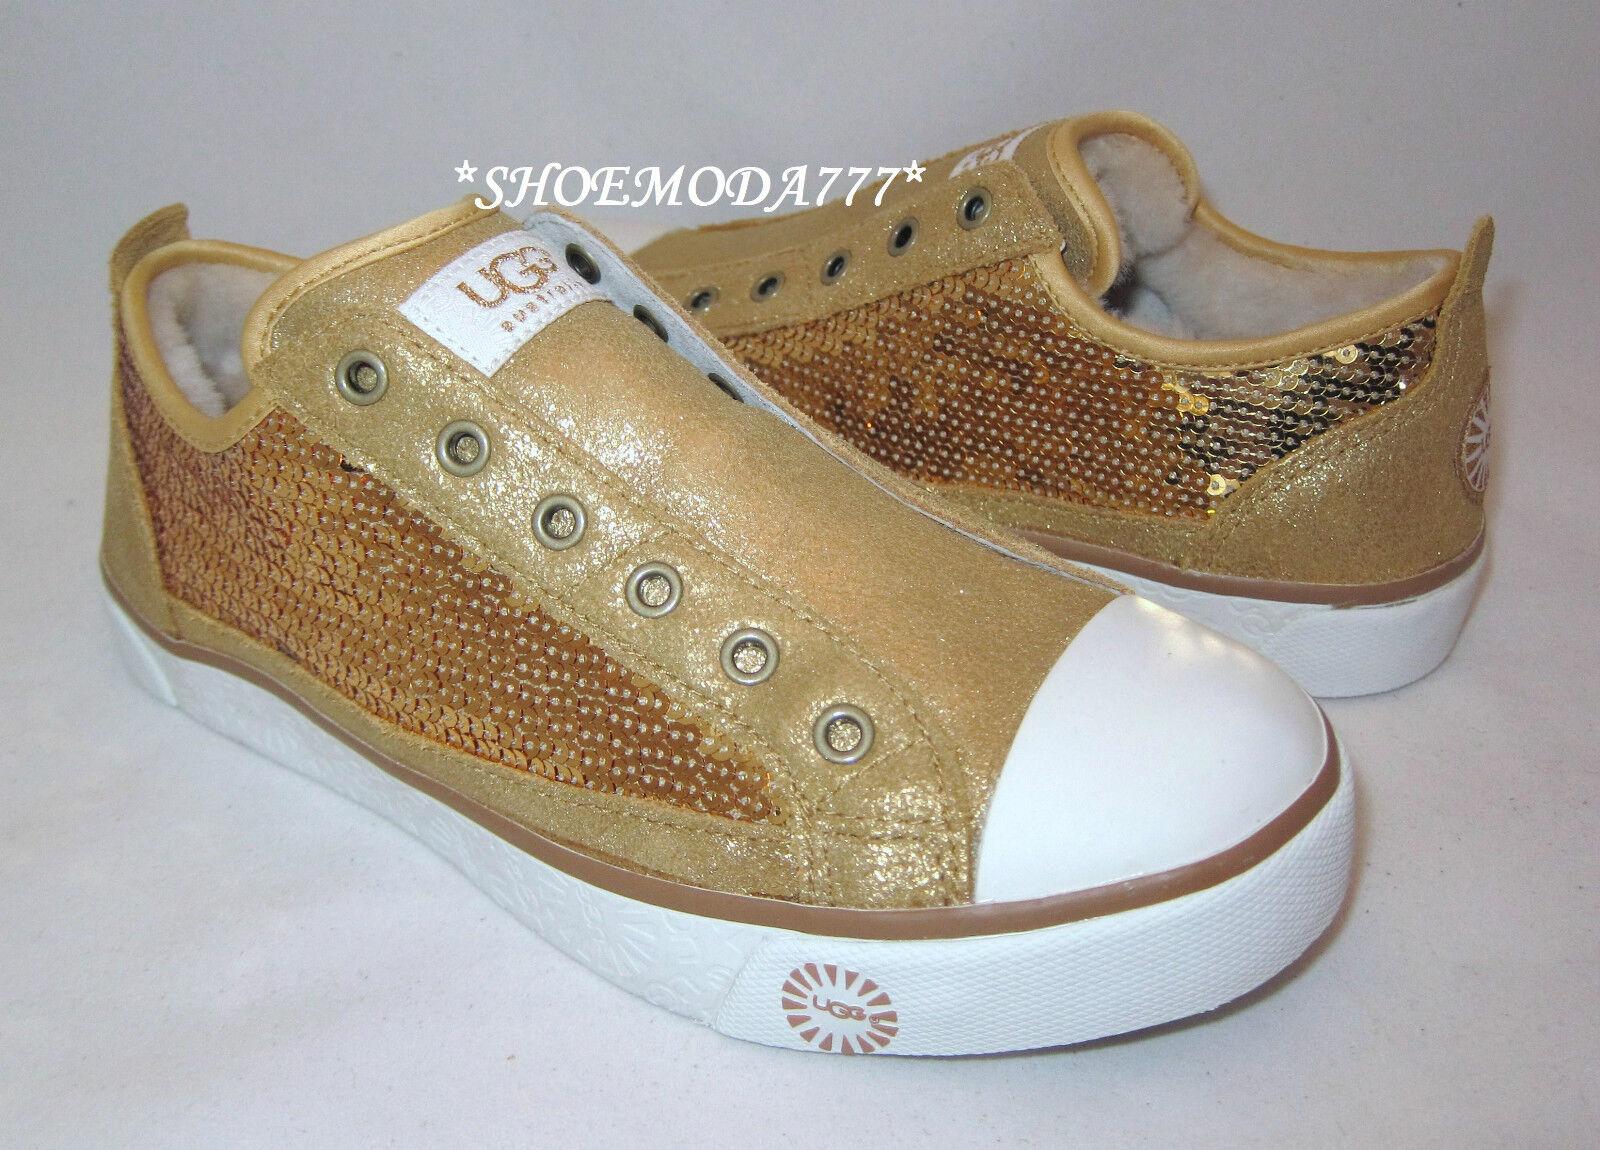 UGG Laela Sparkles Sneaker Schuhe Gold New US 6 7 8 8,5 9,5 10 11 (4,5 5,5 6,5)